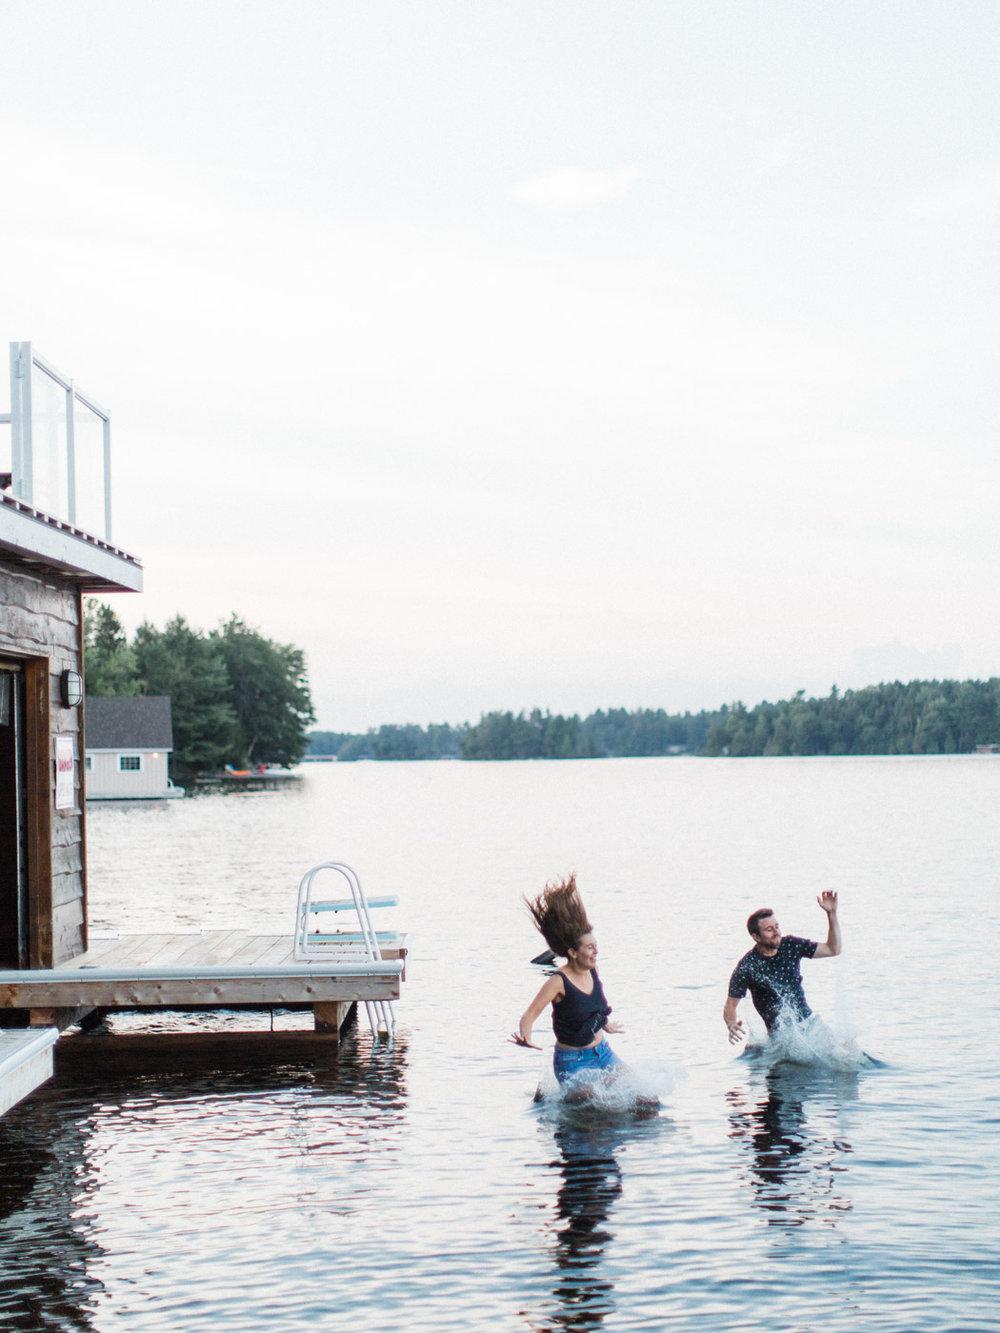 muskoka-wedding-photographer-adventurous-couples-engagement-session-lake-112.jpg